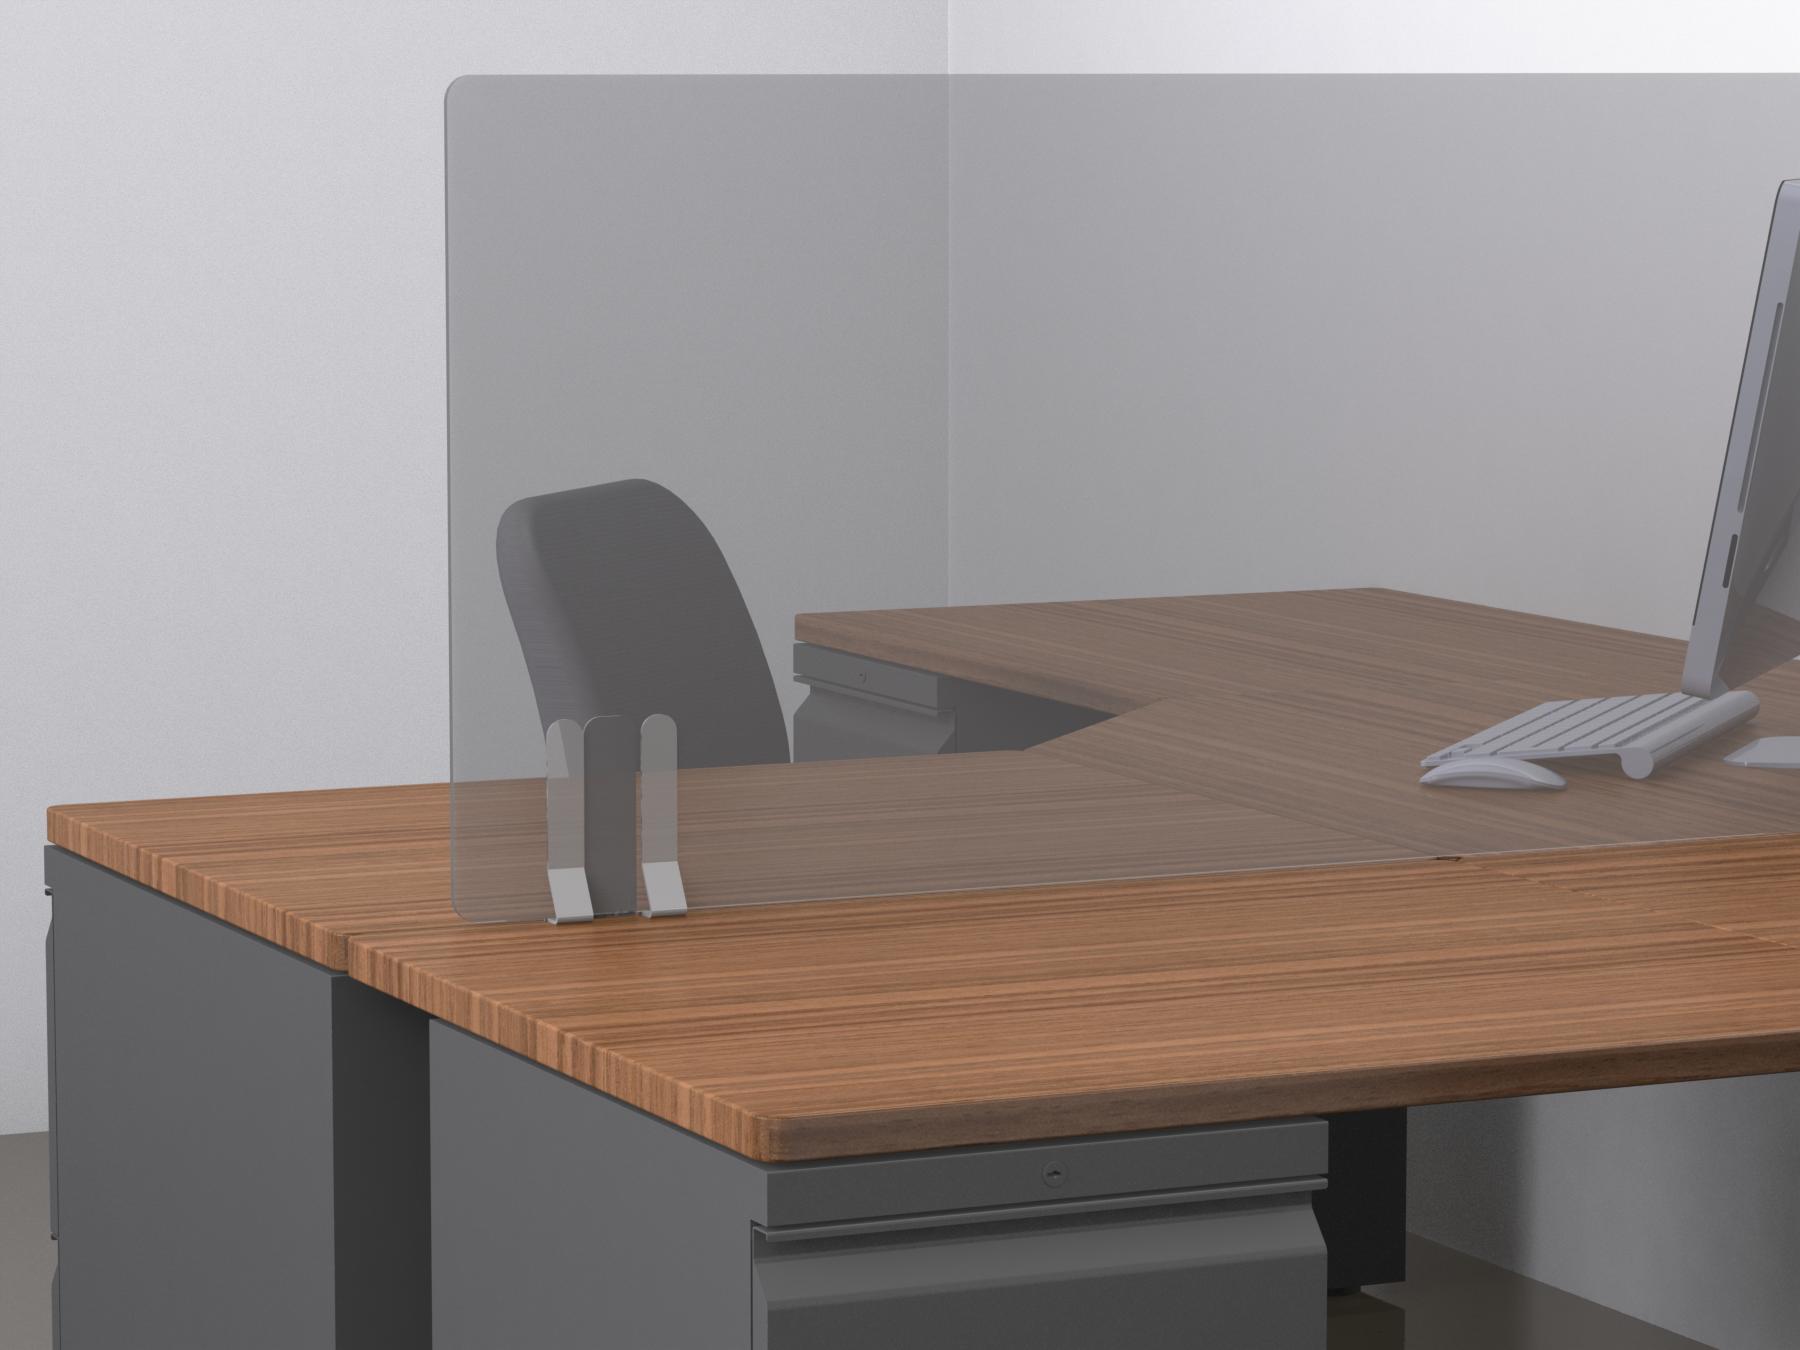 moodprivacy social distancing desk divider